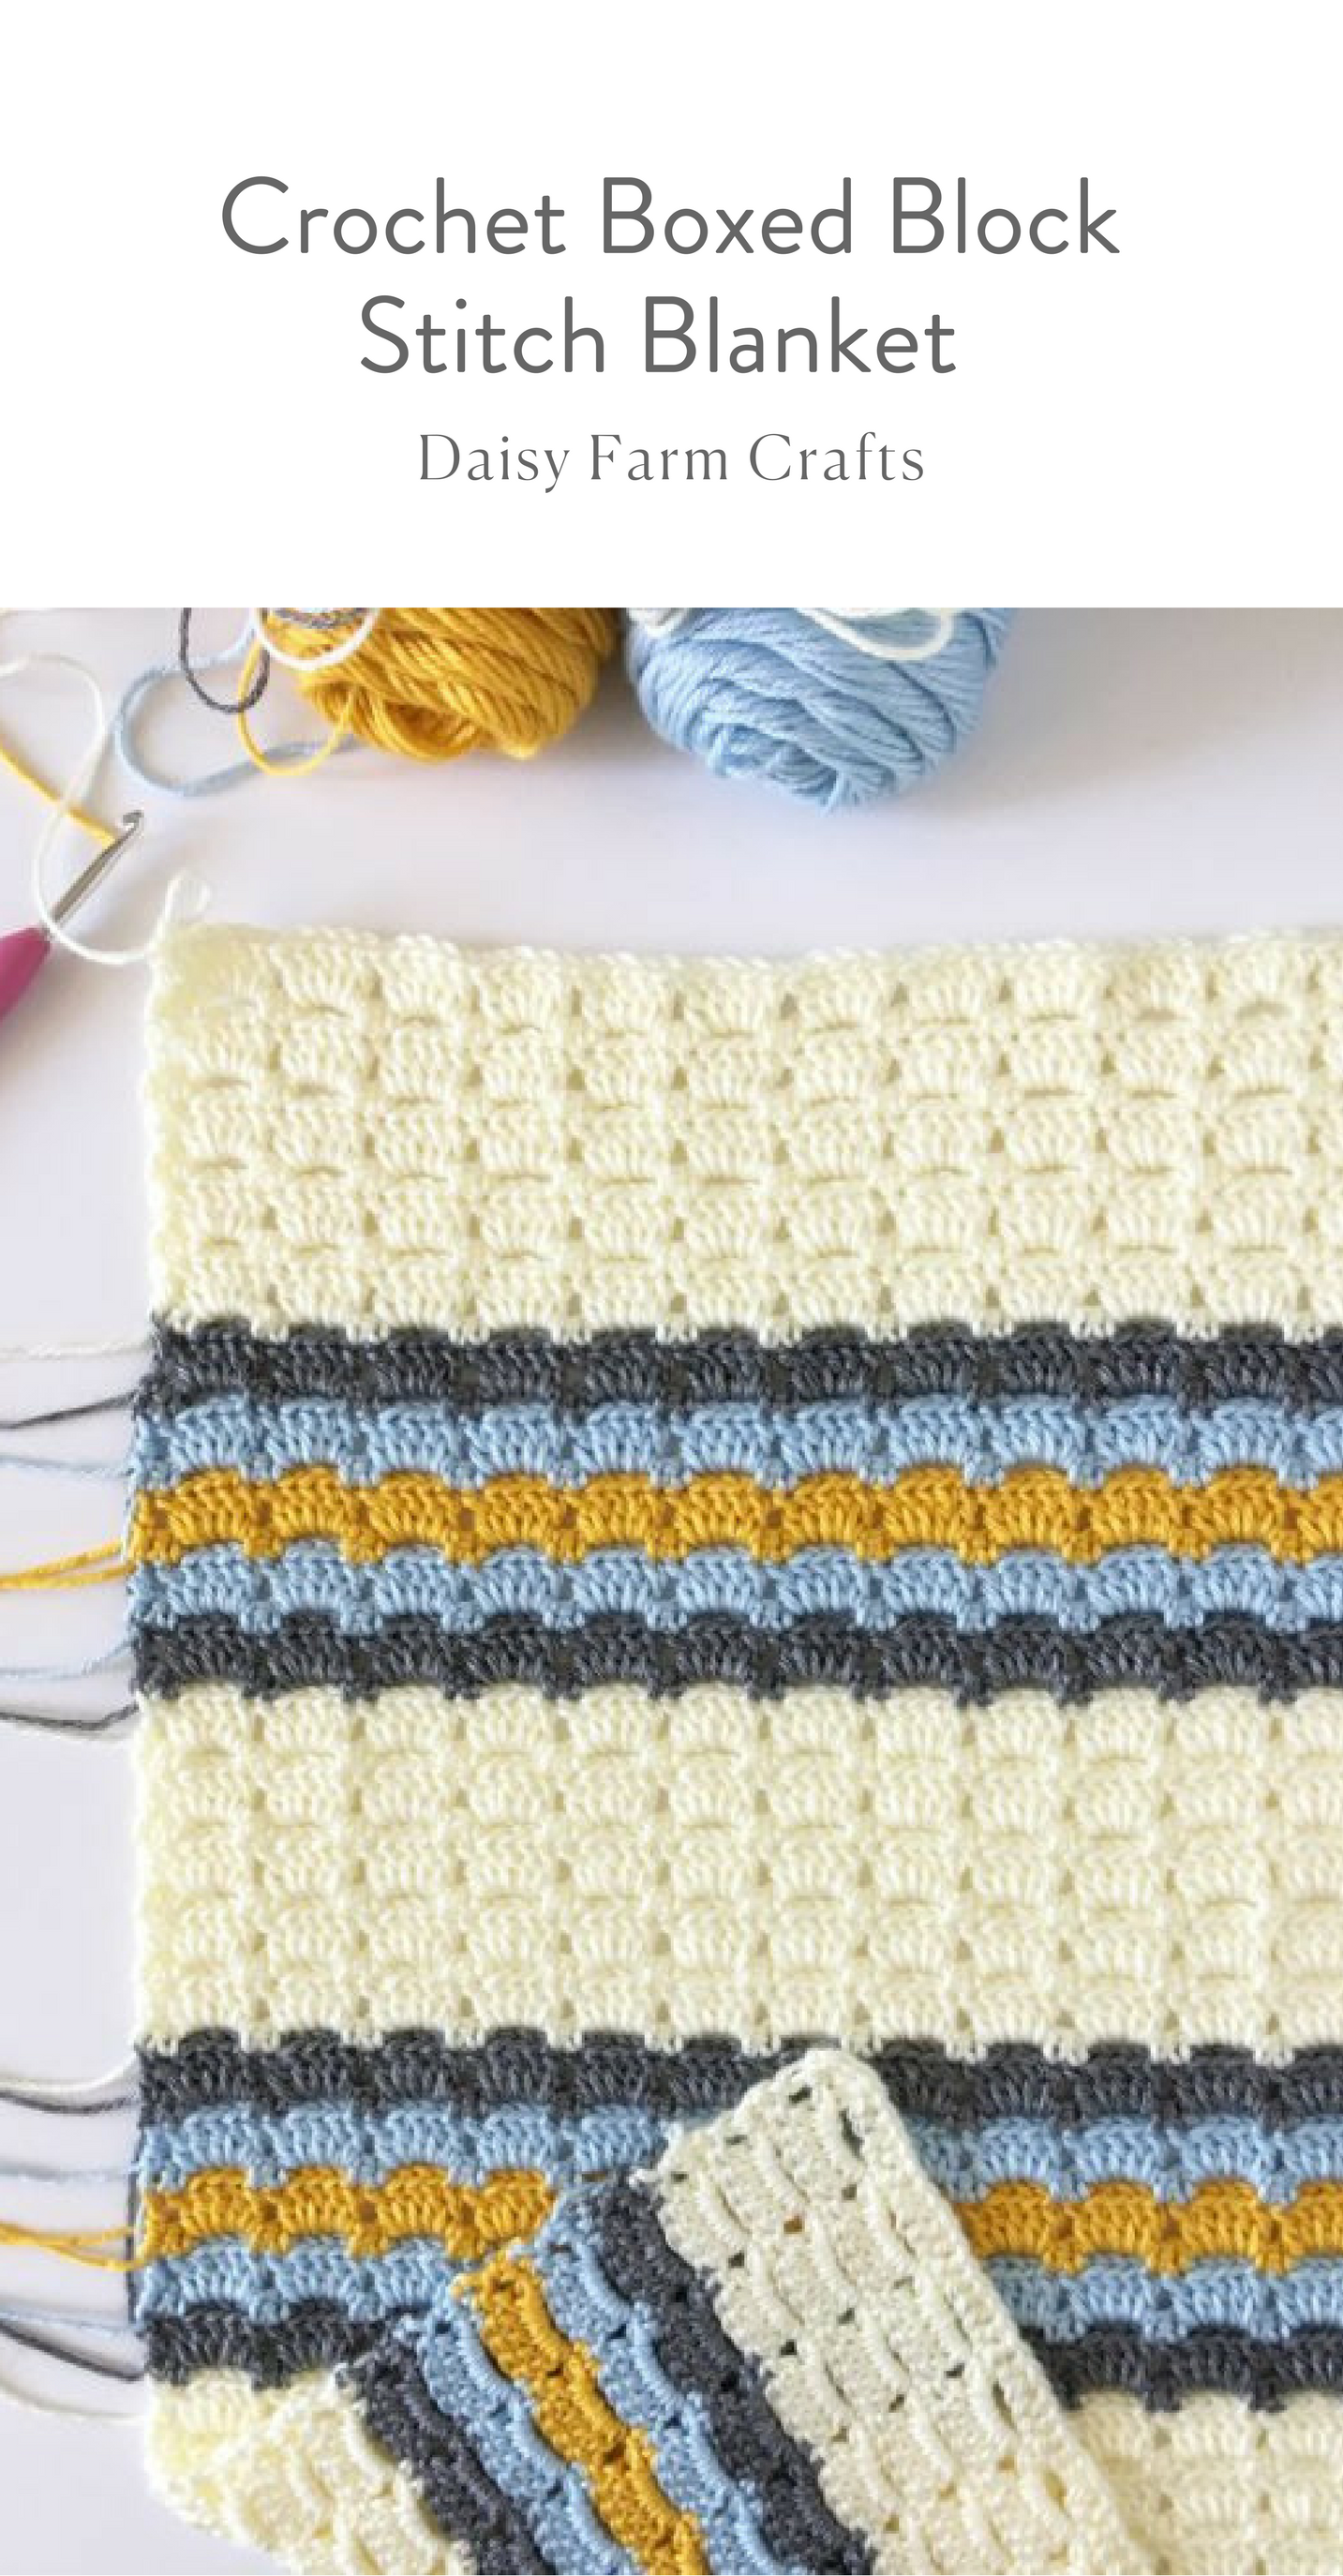 a333dc5fcb1 Free Pattern - Crochet Boxed Block Stitch Blanket  crochetbabyblanket   crochetpattern  crochet